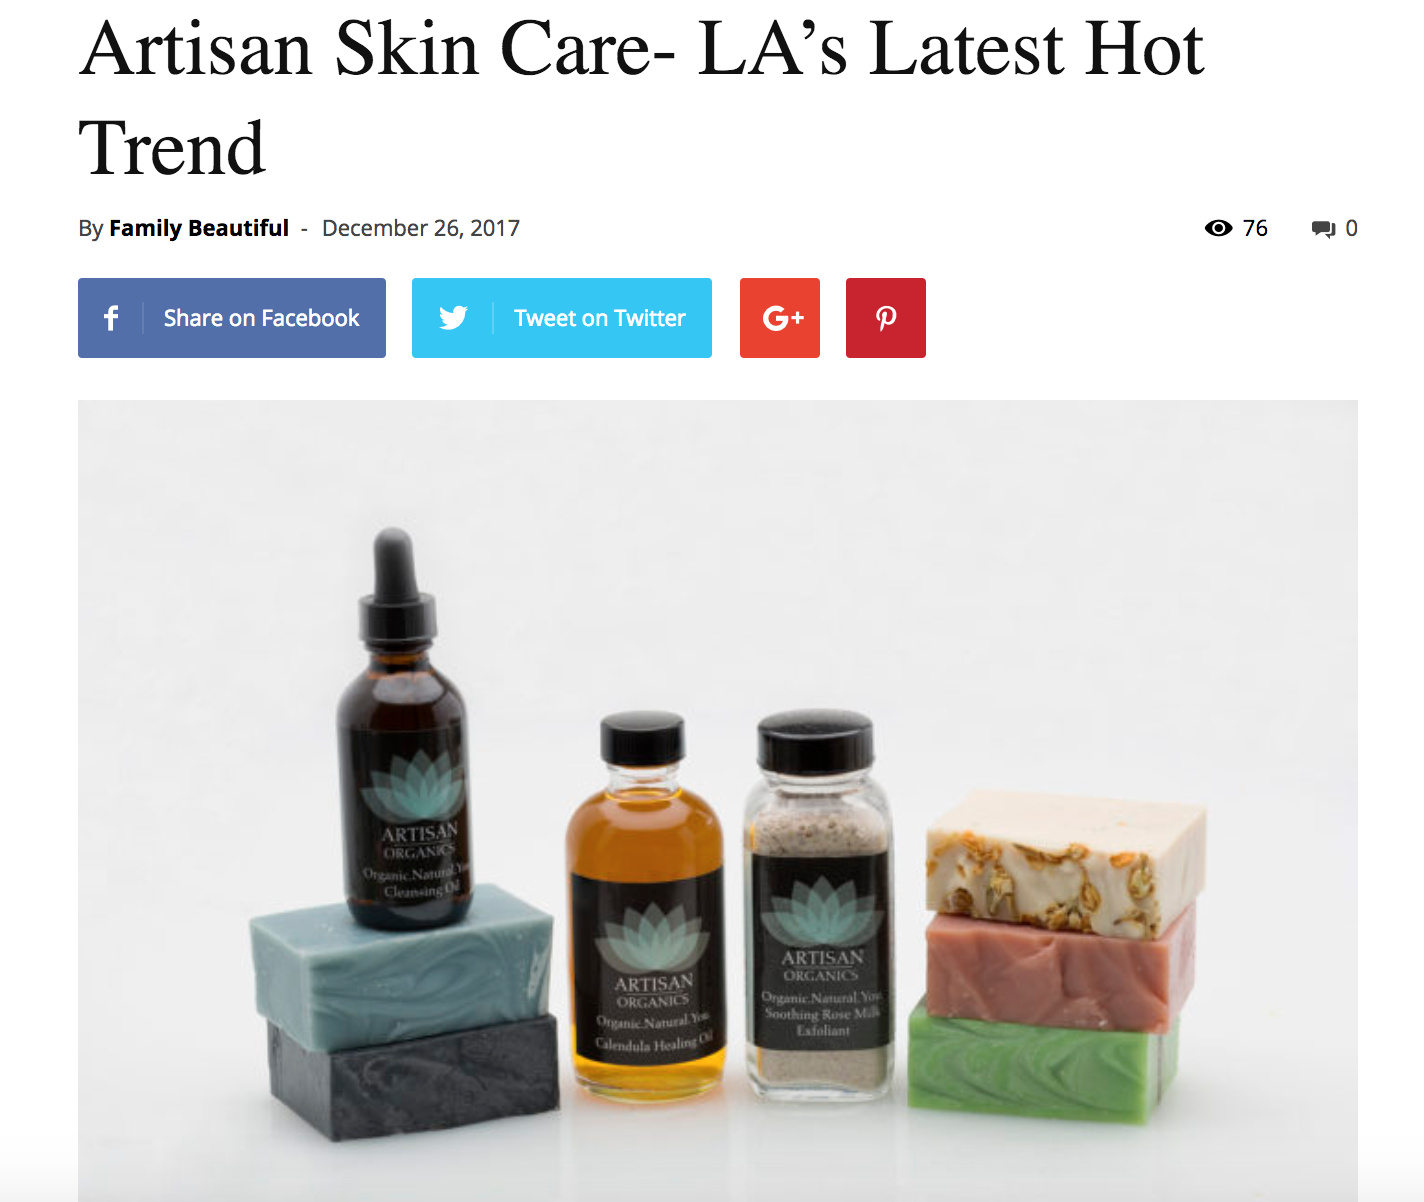 Artisan Skin Care-LA's Latest Hot Trend